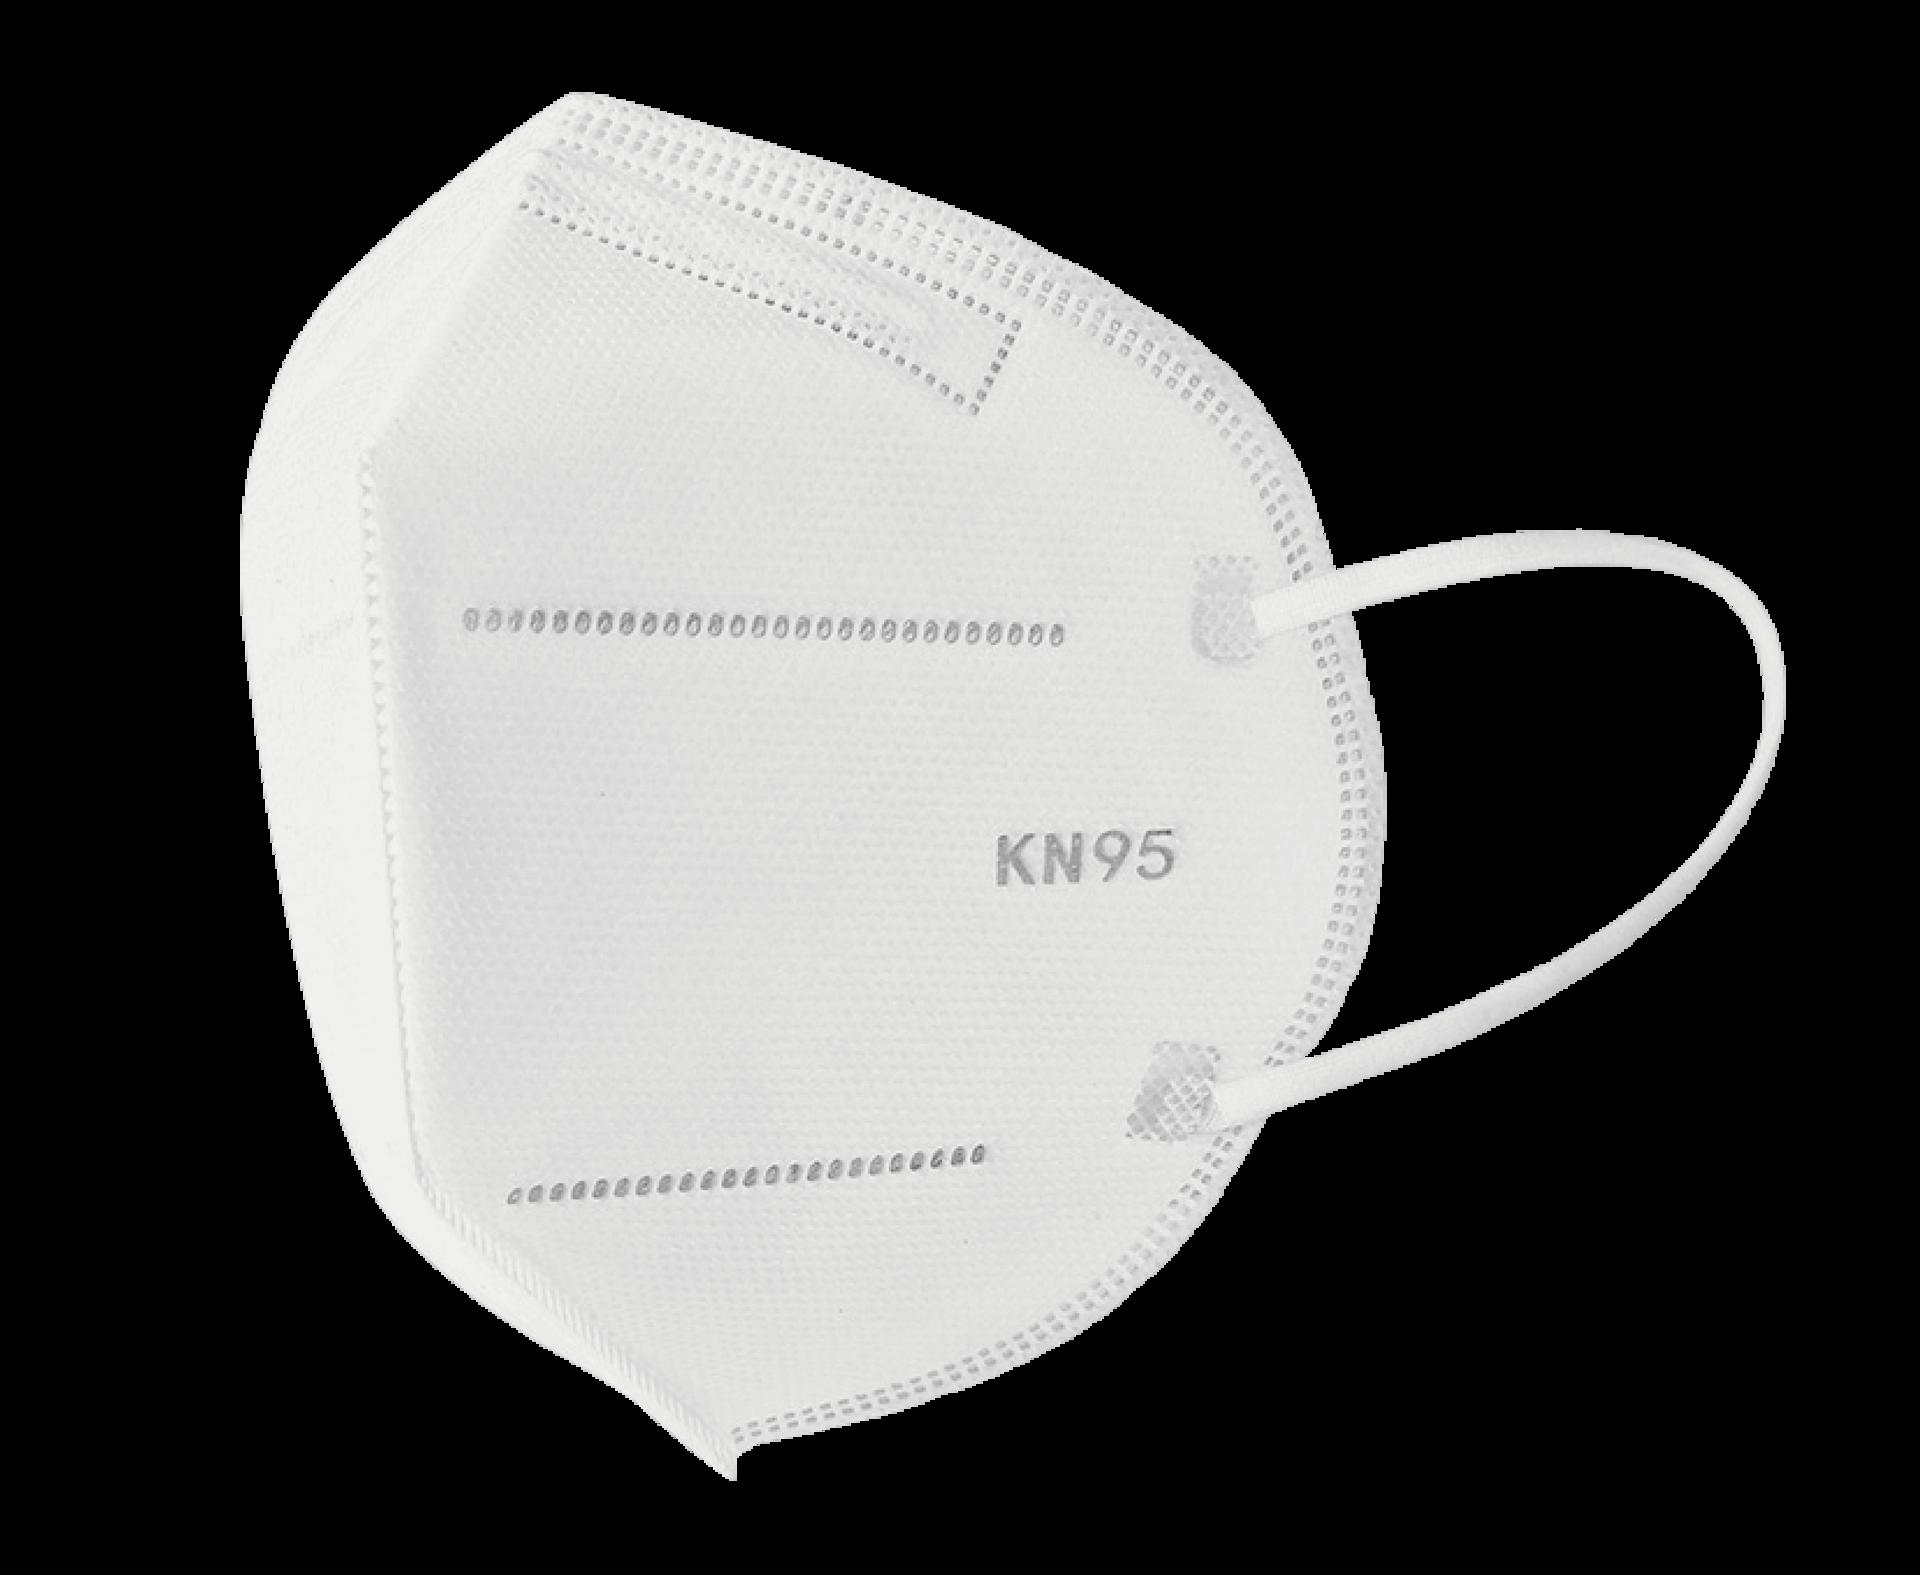 KN95 Particulate Respirator mask